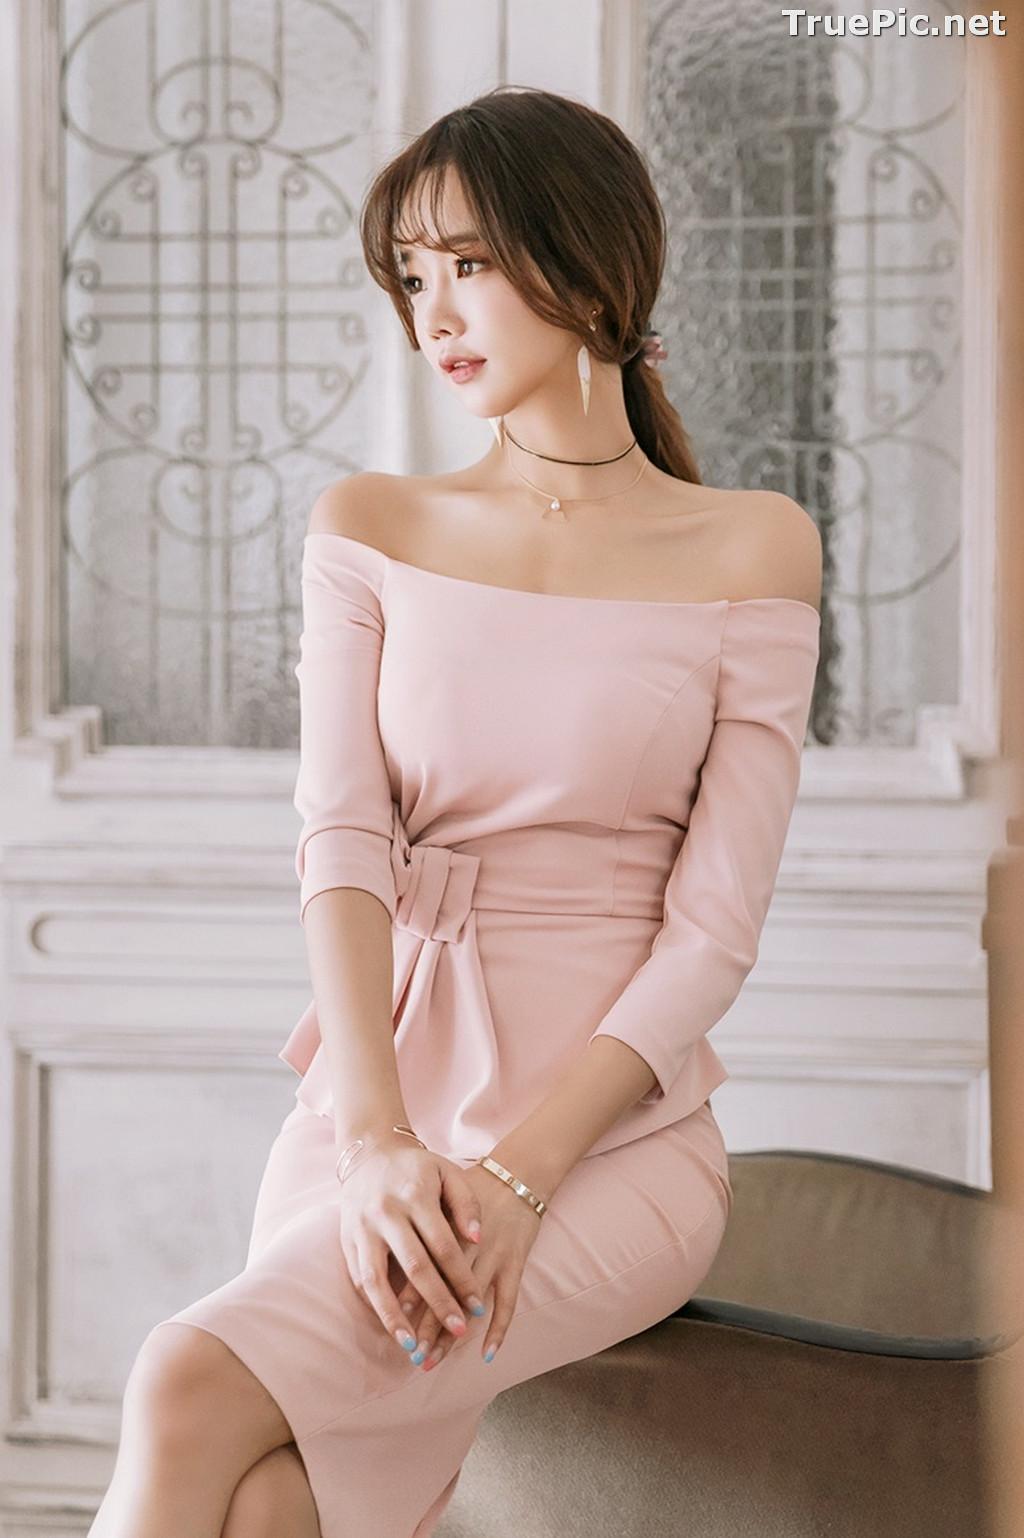 Image Korean Fashion Model - Kang Eun Wook - Slim Fit Bodycon Dress - TruePic.net - Picture-1